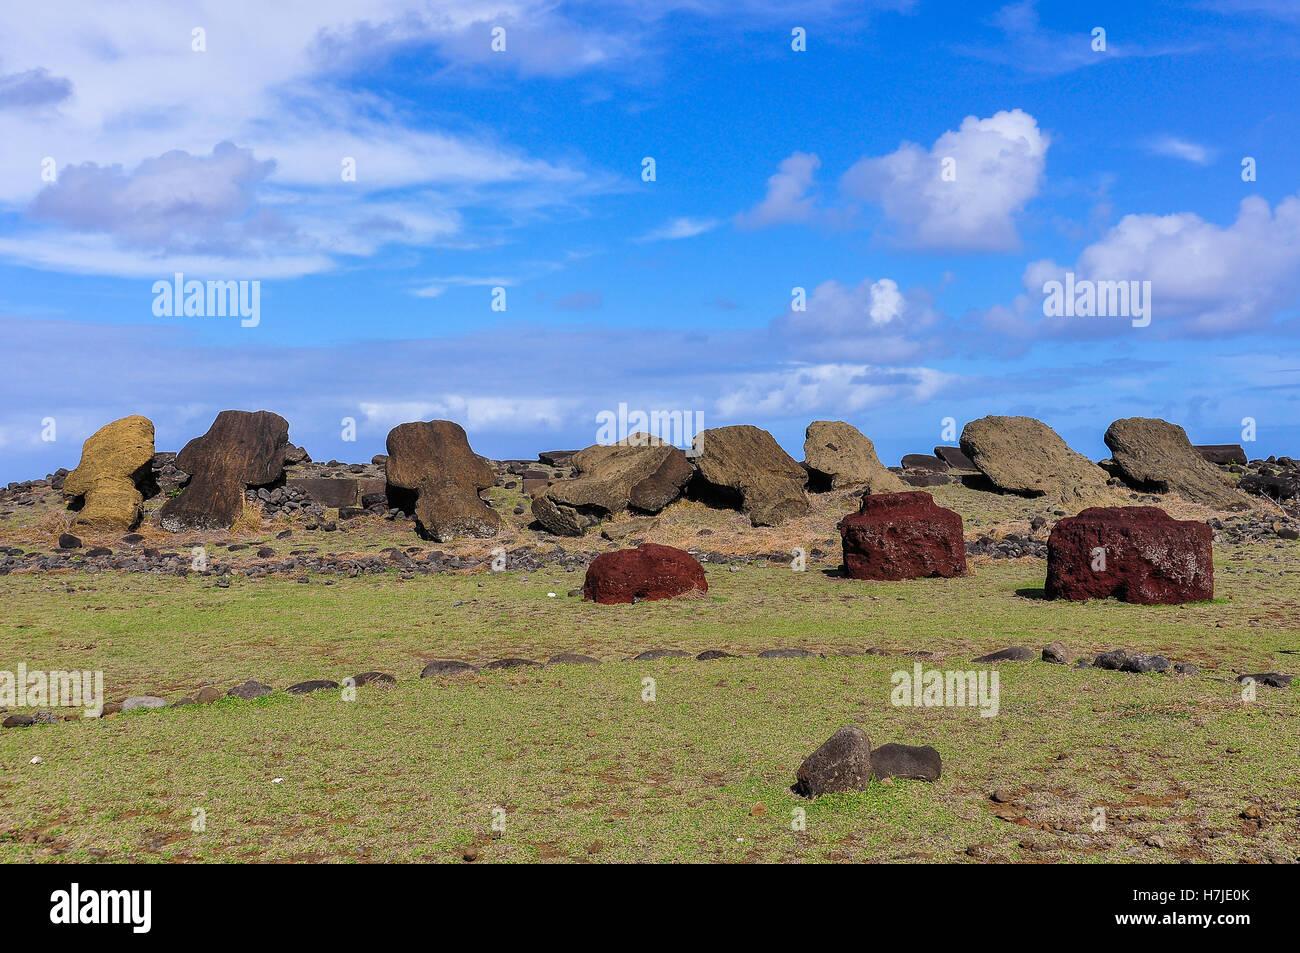 Moai statua rovine nel sito Akahanga, Isola di Pasqua, Cile Immagini Stock